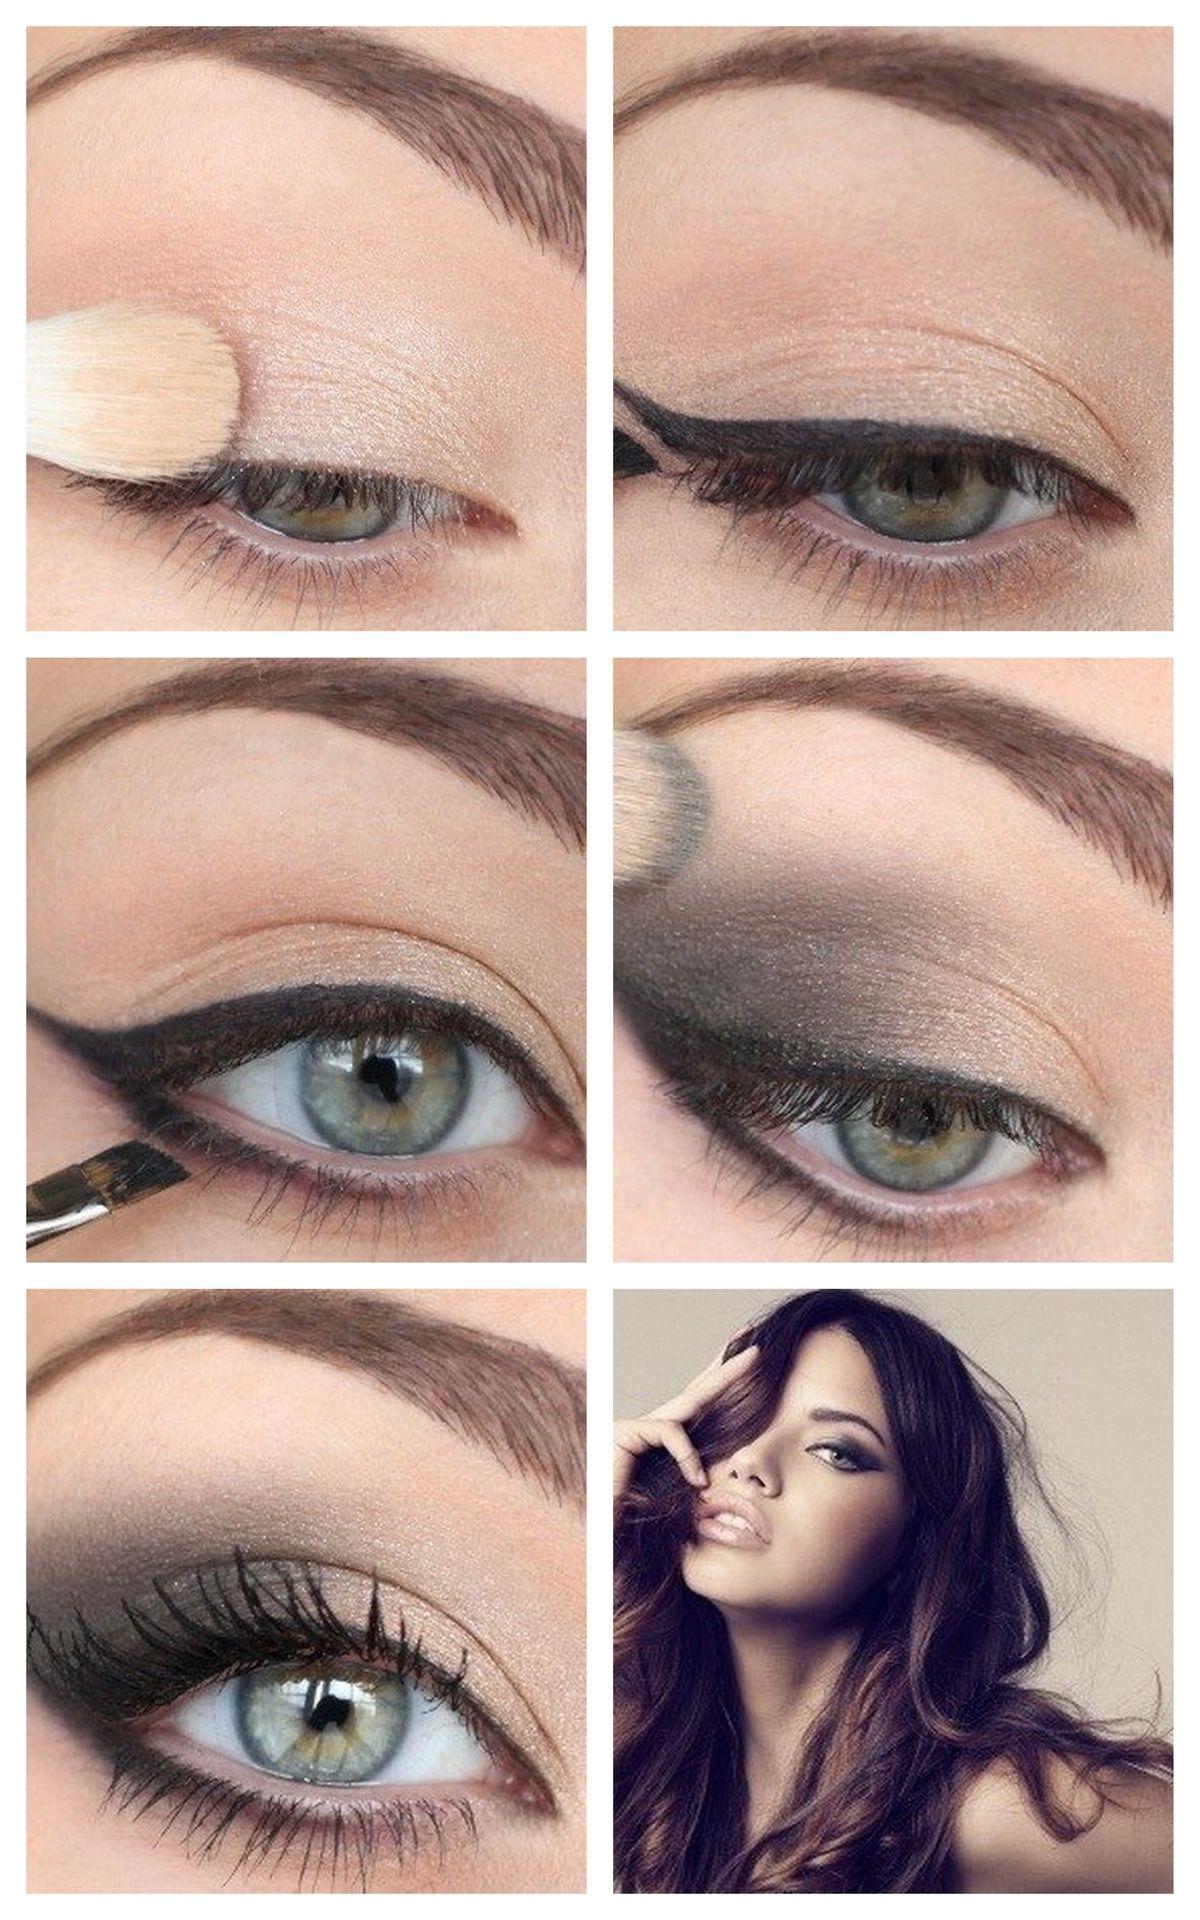 pin by talerie stemple on beauty tips | smoky eye makeup